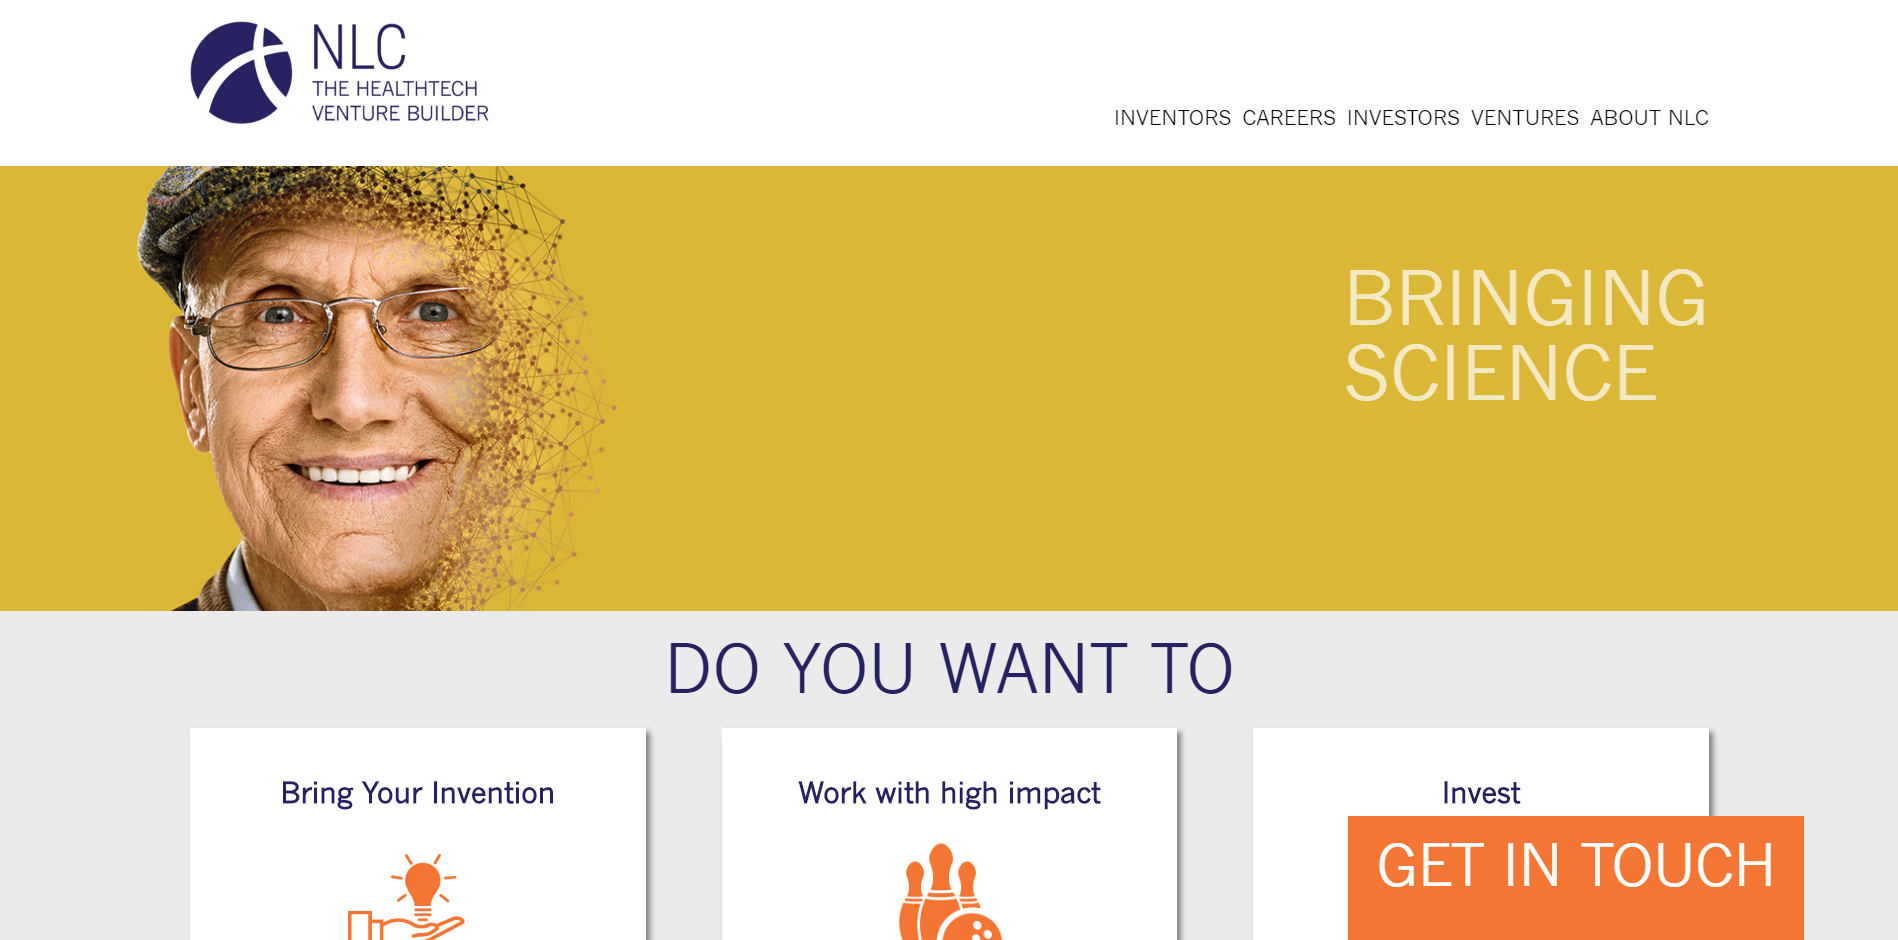 NLC - the Healthtech Venture Builder